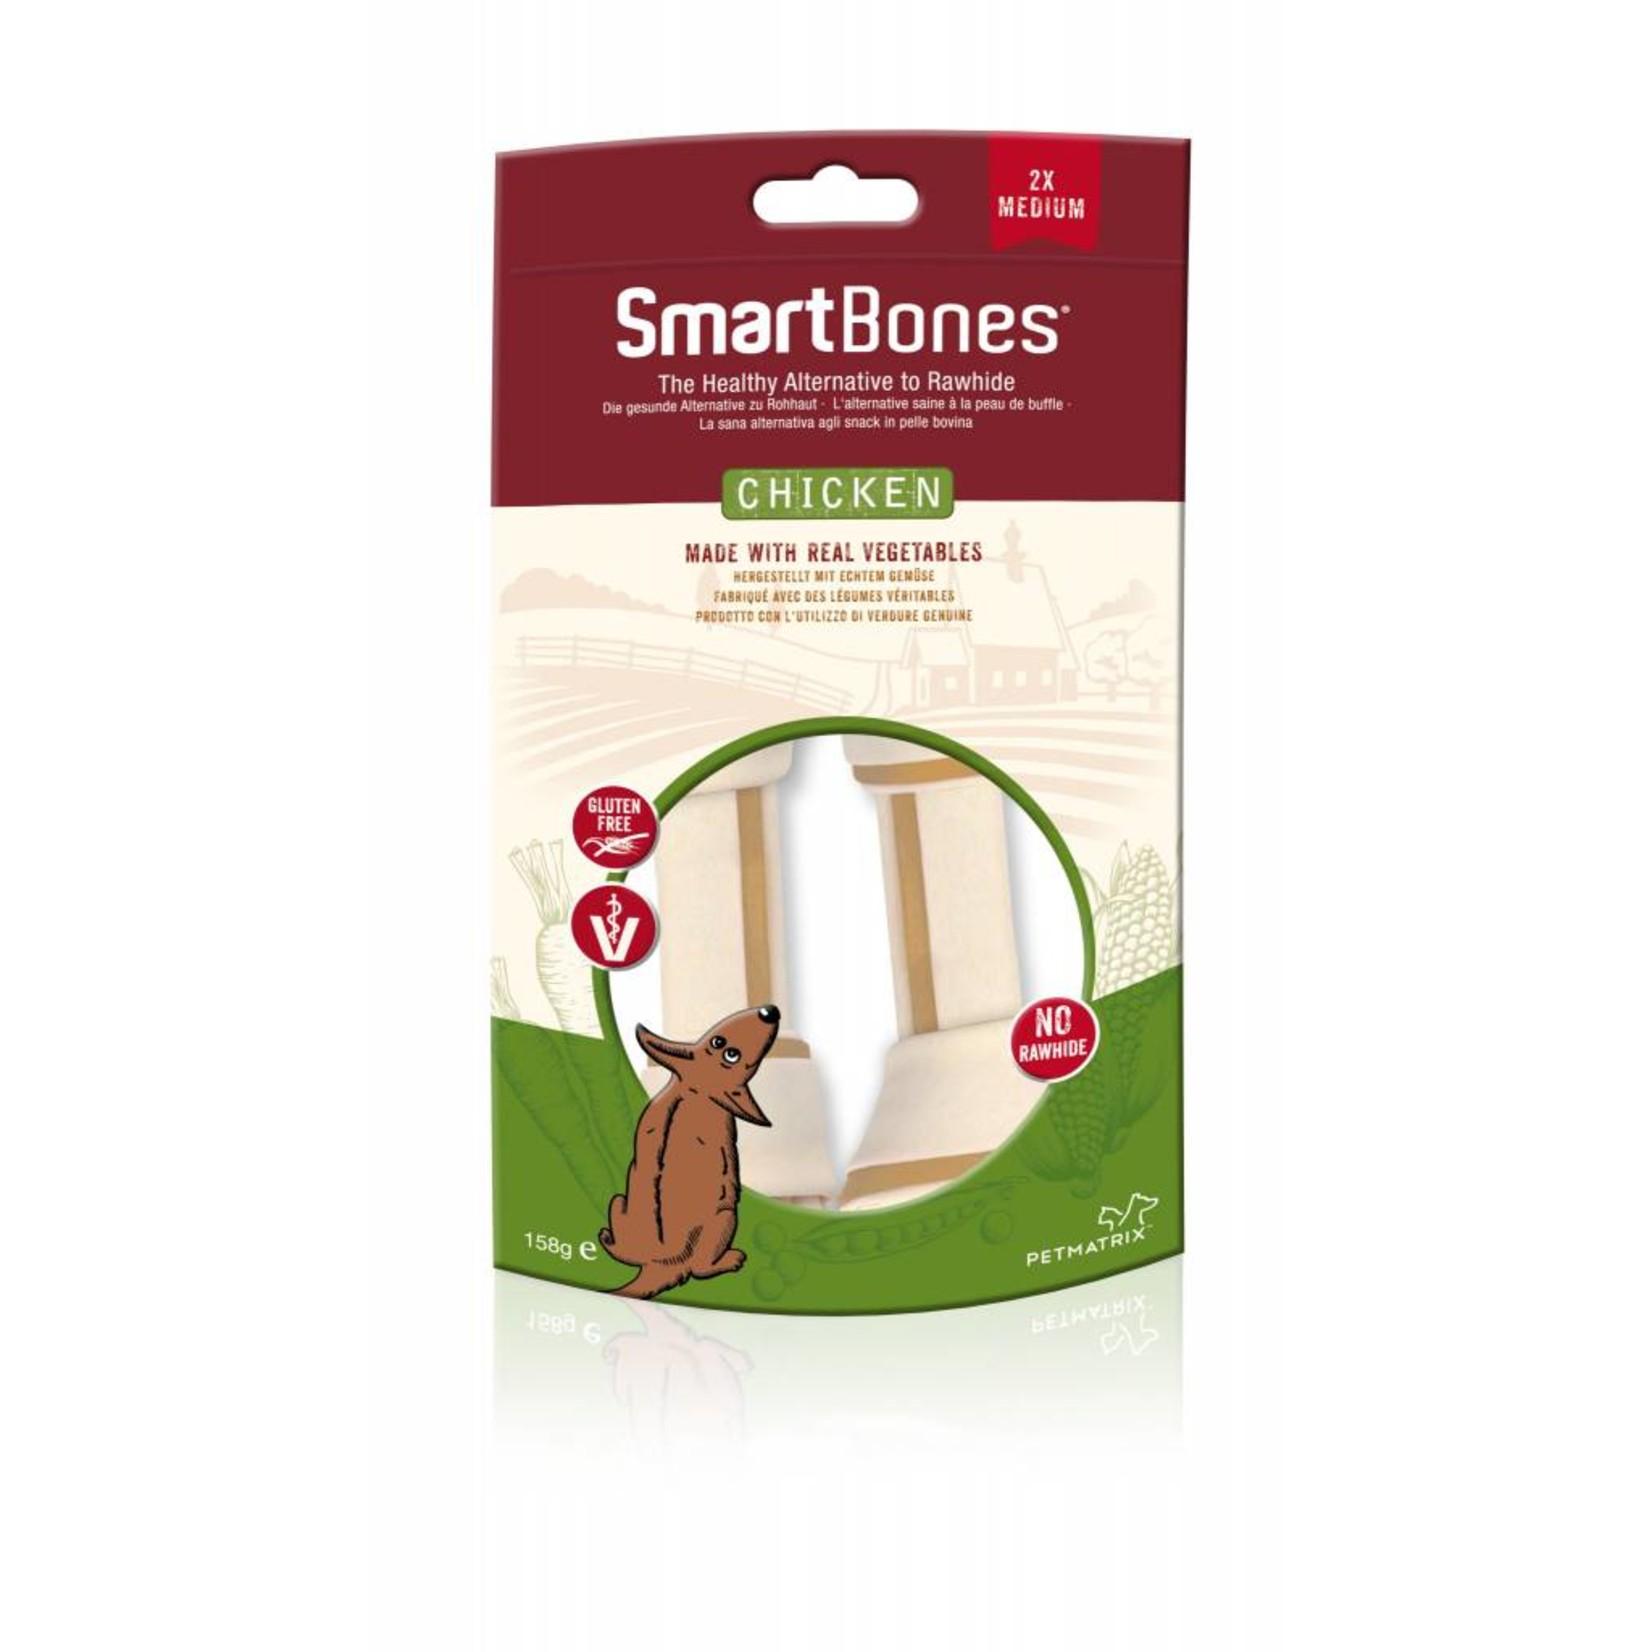 SmartBones Rawhide Alternative Chicken Bones Dog Treats, Medium, 2 pack